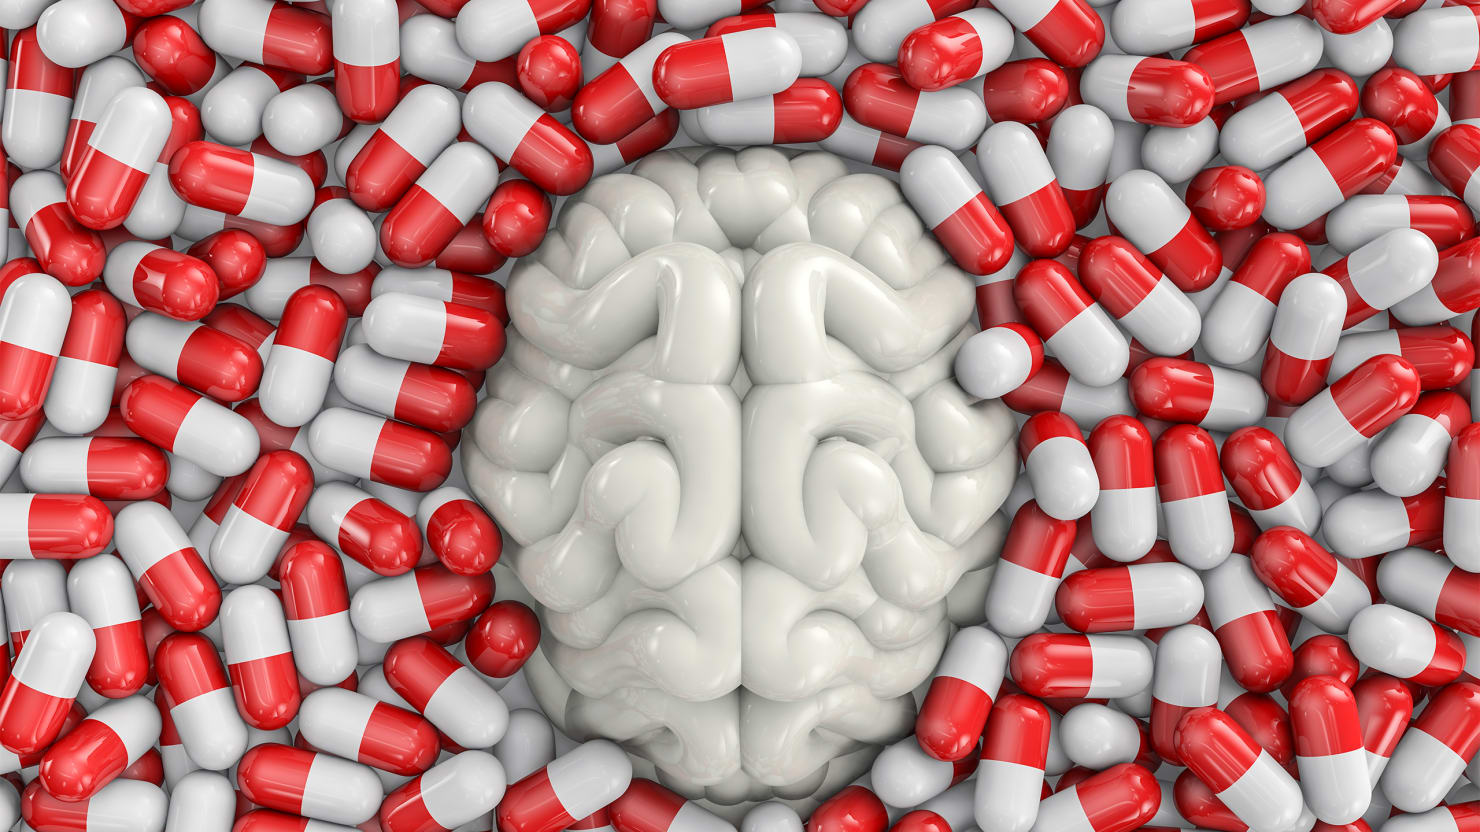 Can Adderall Abuse Trigger Temporary Schizophrenia?